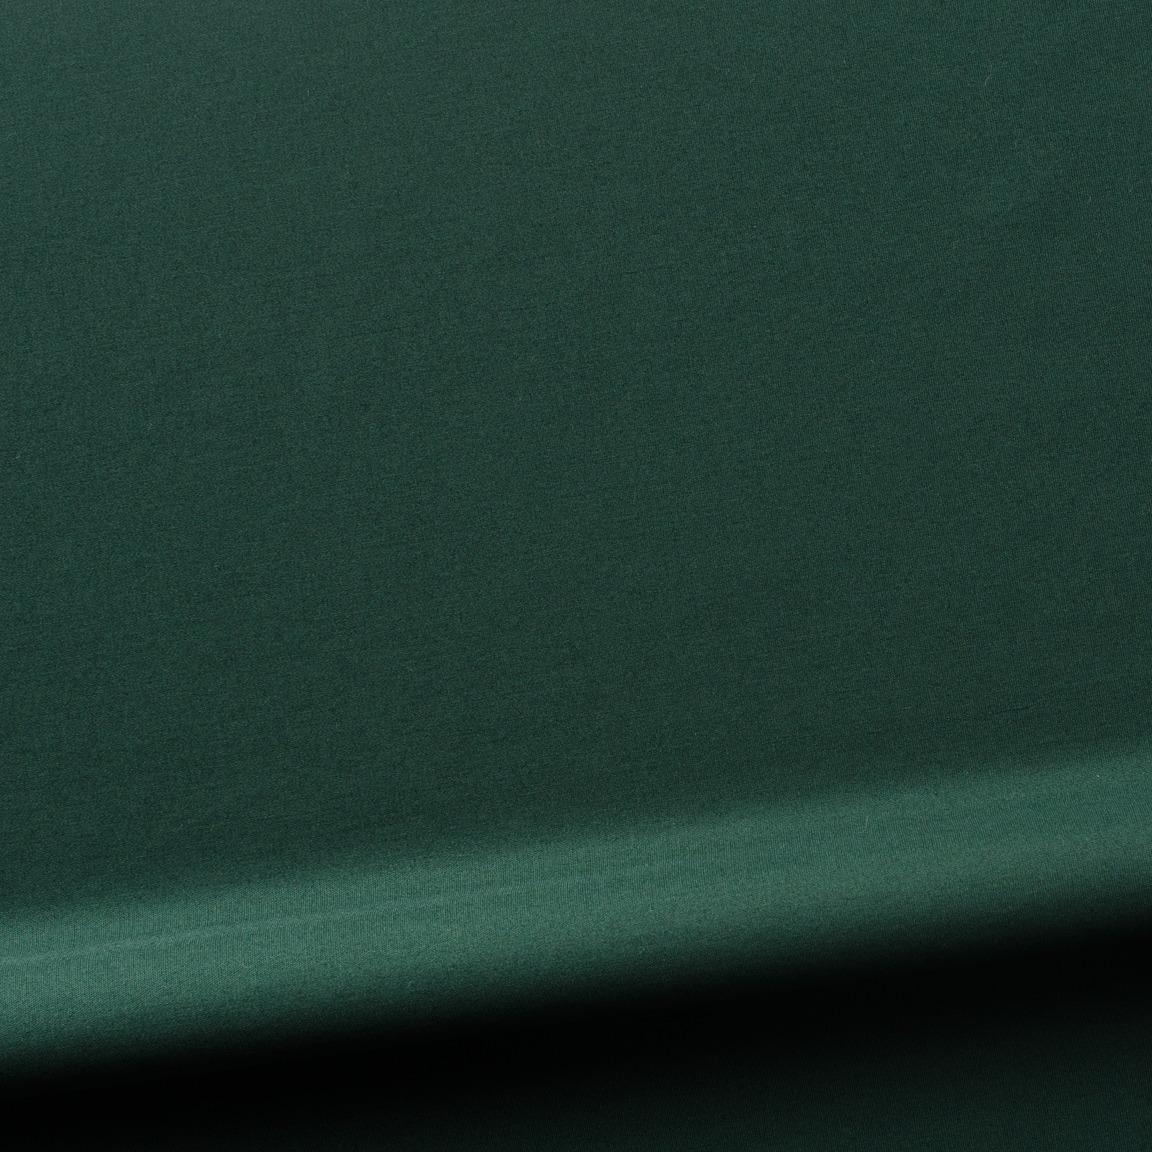 Milano, dark green